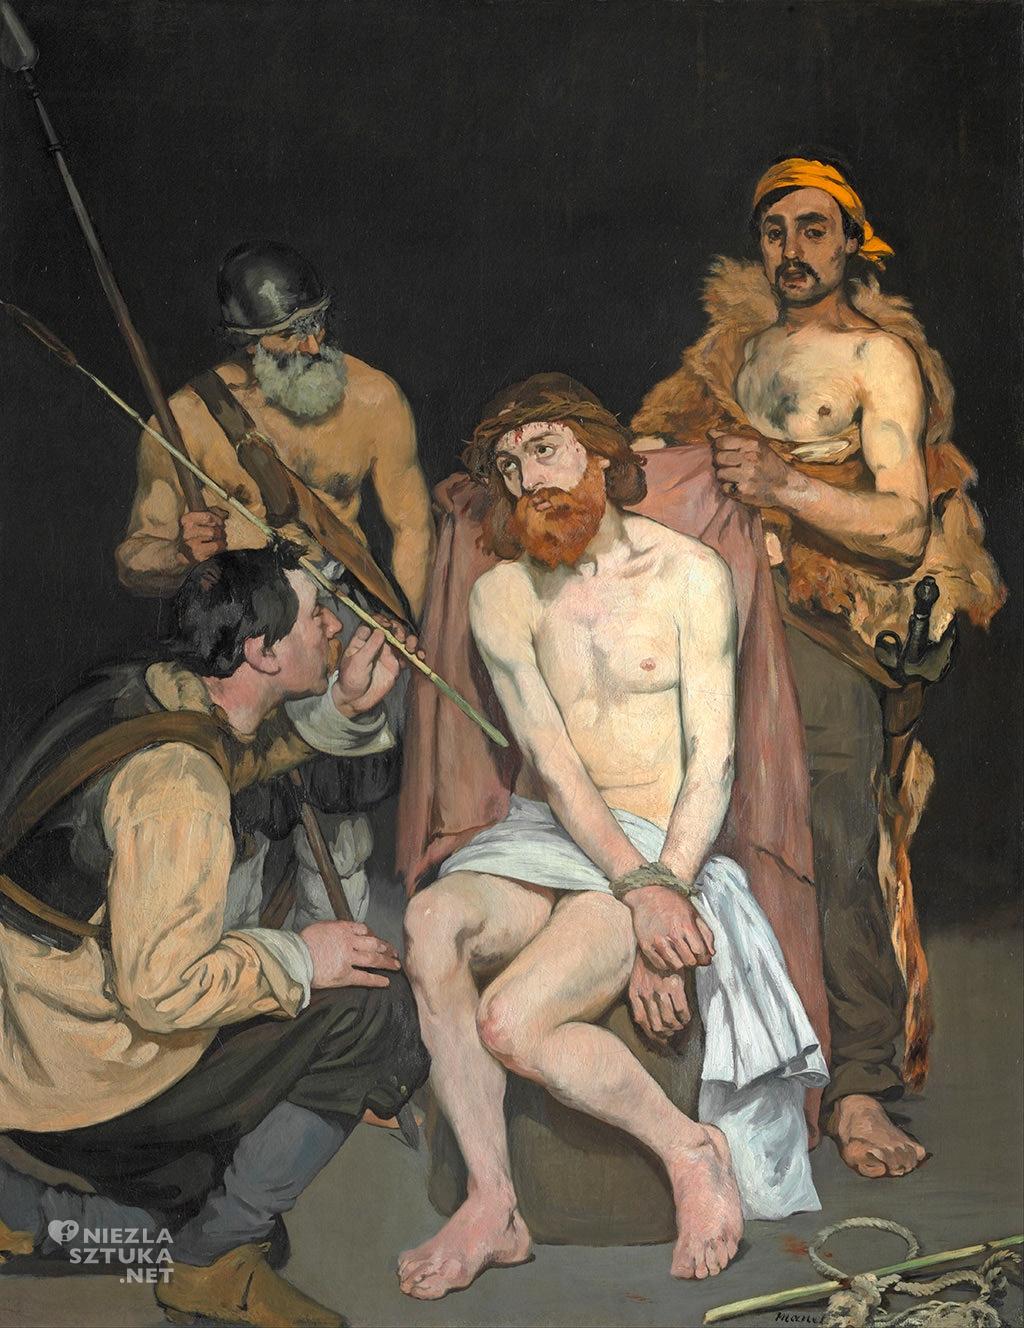 Édouard Manet, Męczenie Chrystusa |1865, Art Institut of Chicago